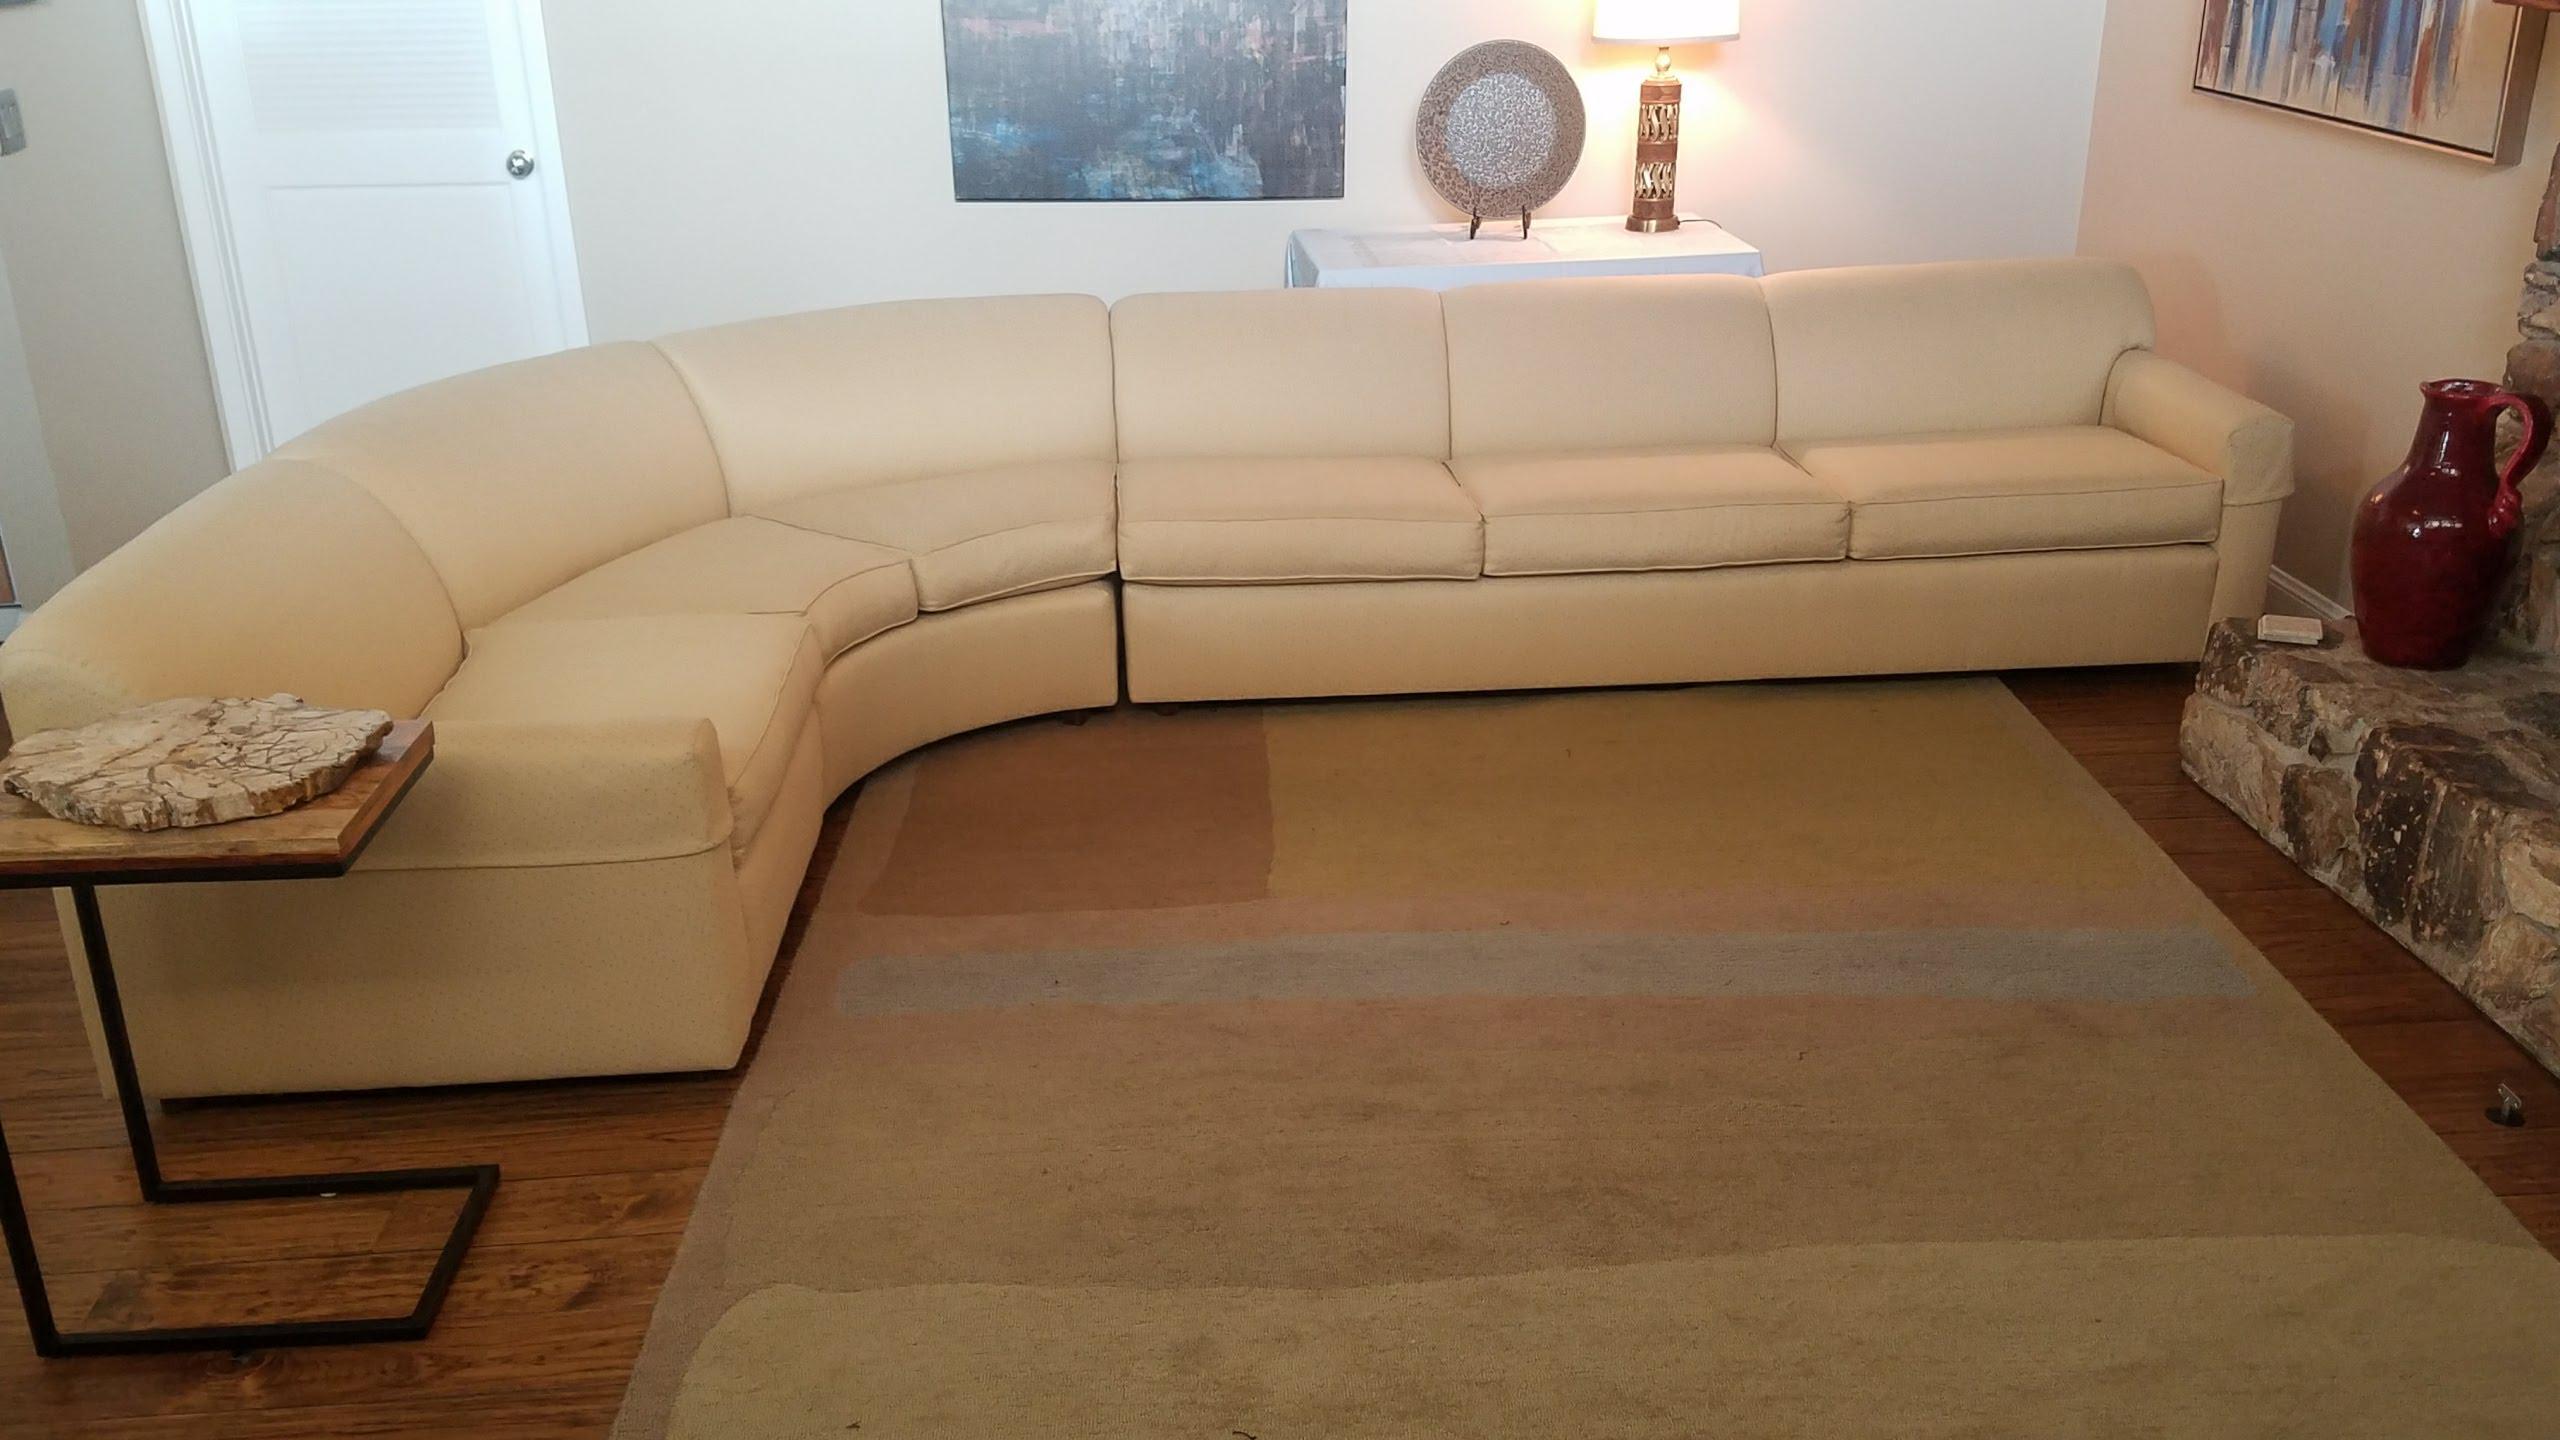 Peck U0026 Hills Custom Curved 3 Piece Sectional Sofa   Image 7 Of 11